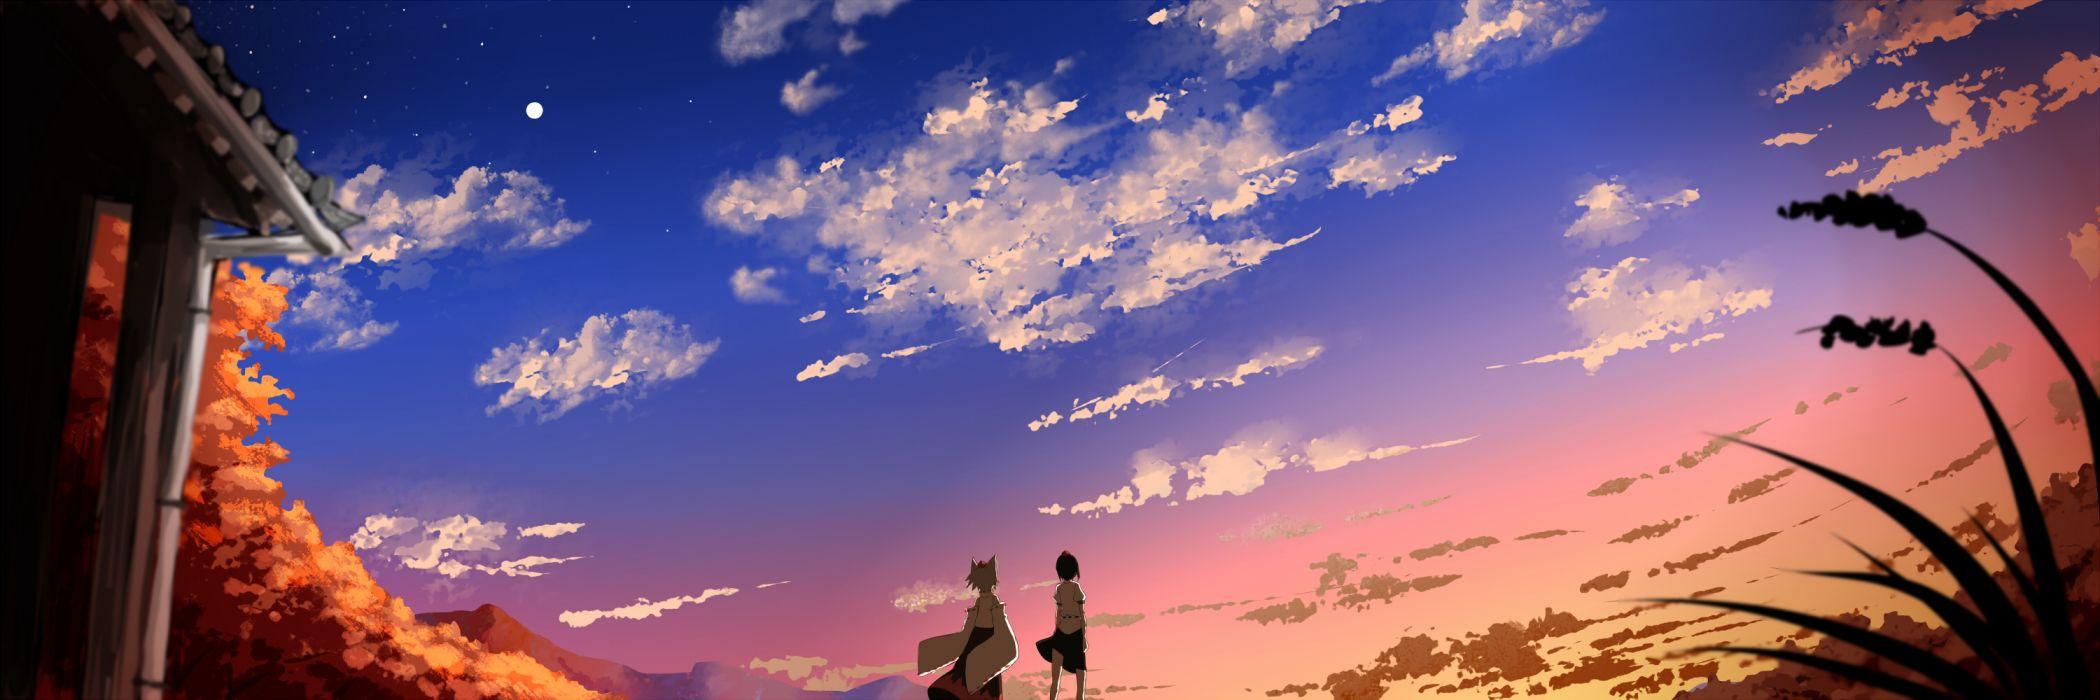 clouds hutotomomo inubashiri momiji landscape scenic shameimaru aya sky sunset touhou wallpaper